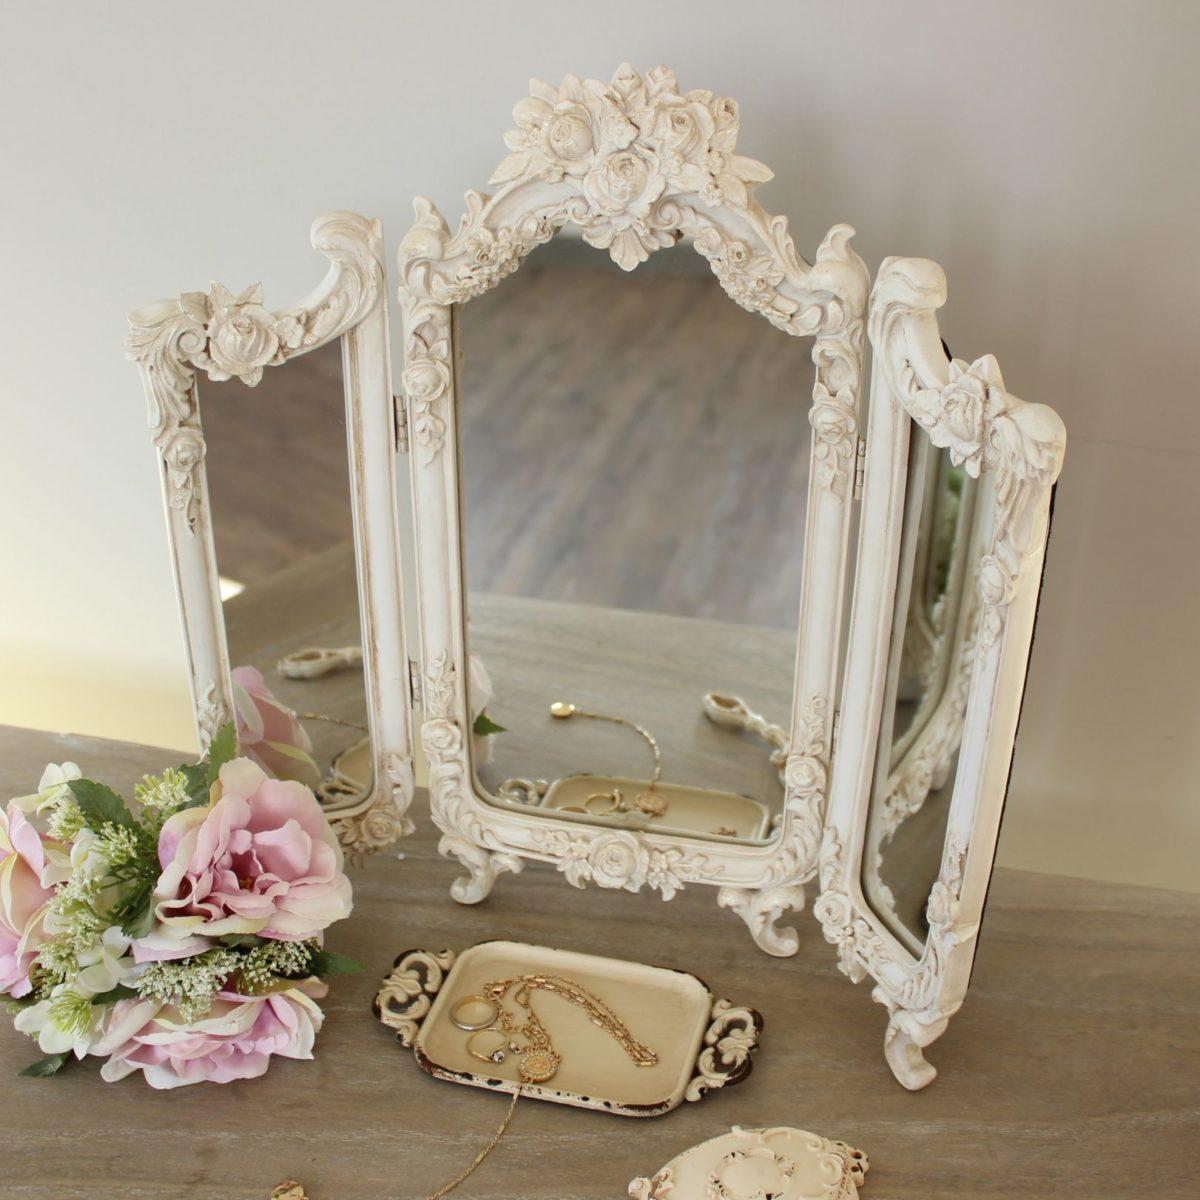 obr.19_melody-maison-ornate-rose-triple-mirror-1200x1200.jpg